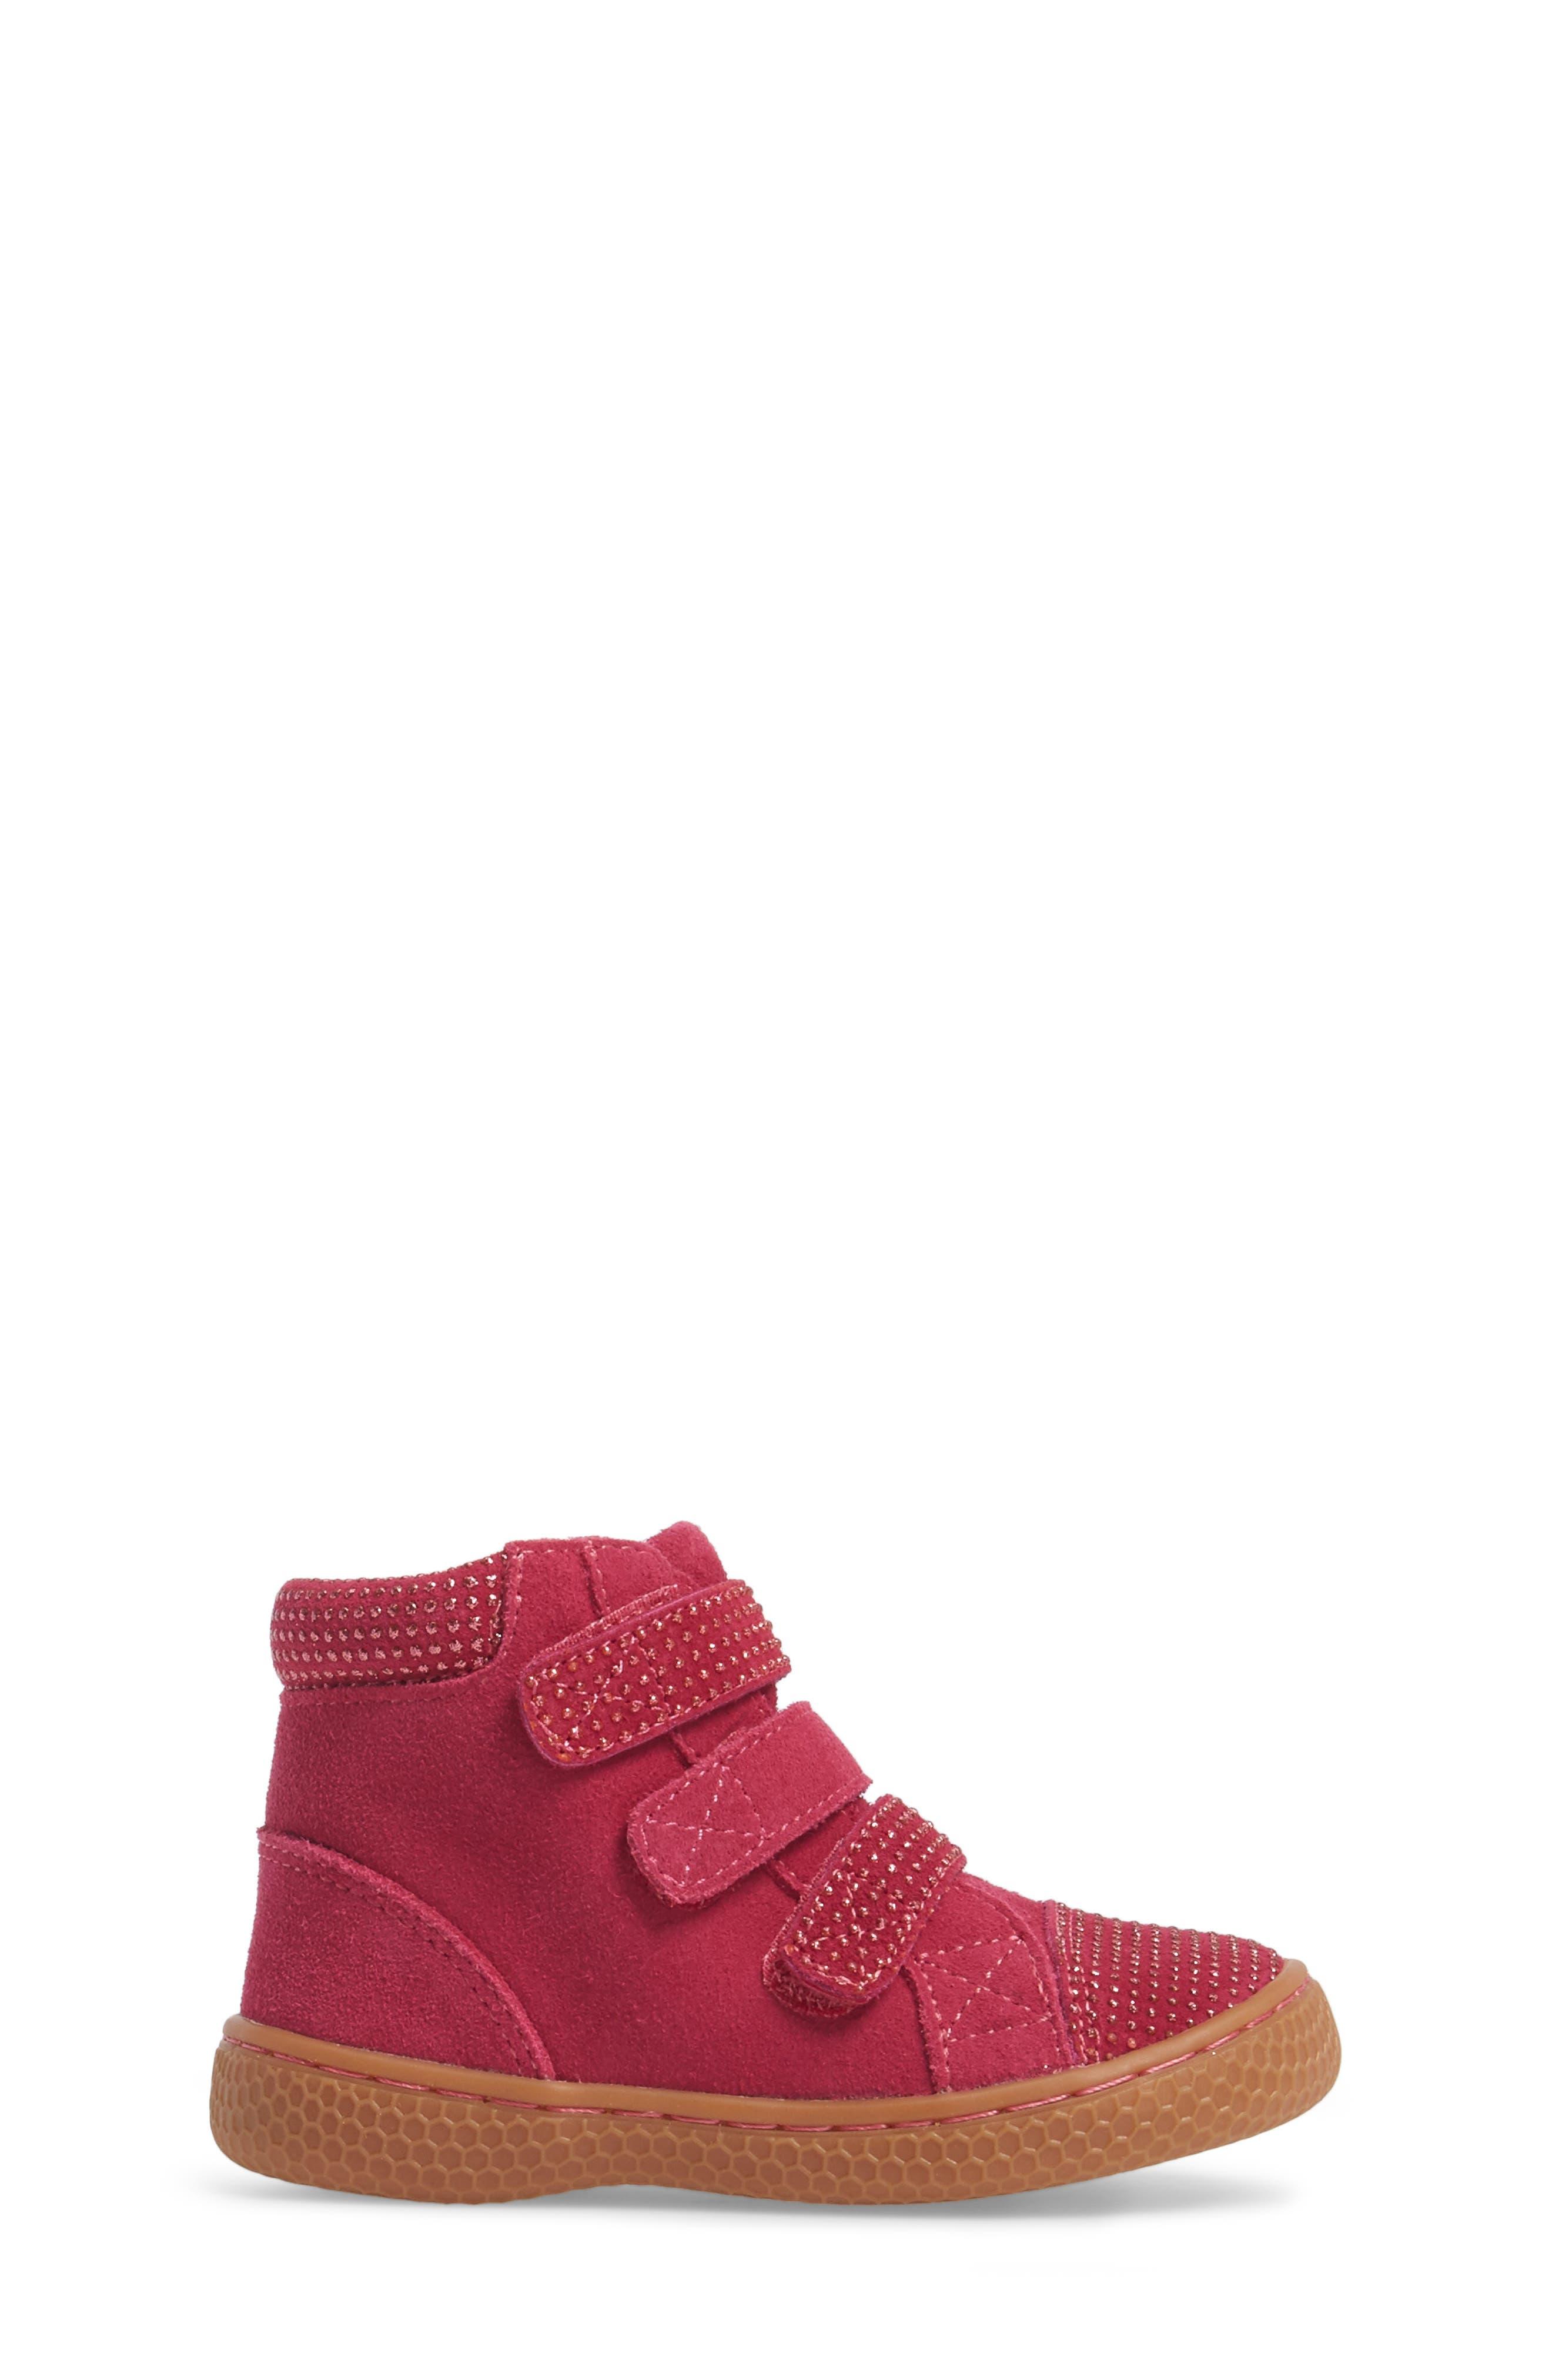 Alternate Image 3  - Livie & Luca 'Jamie' High Top Sneaker (Baby, Walker, Toddler & Little Kid)